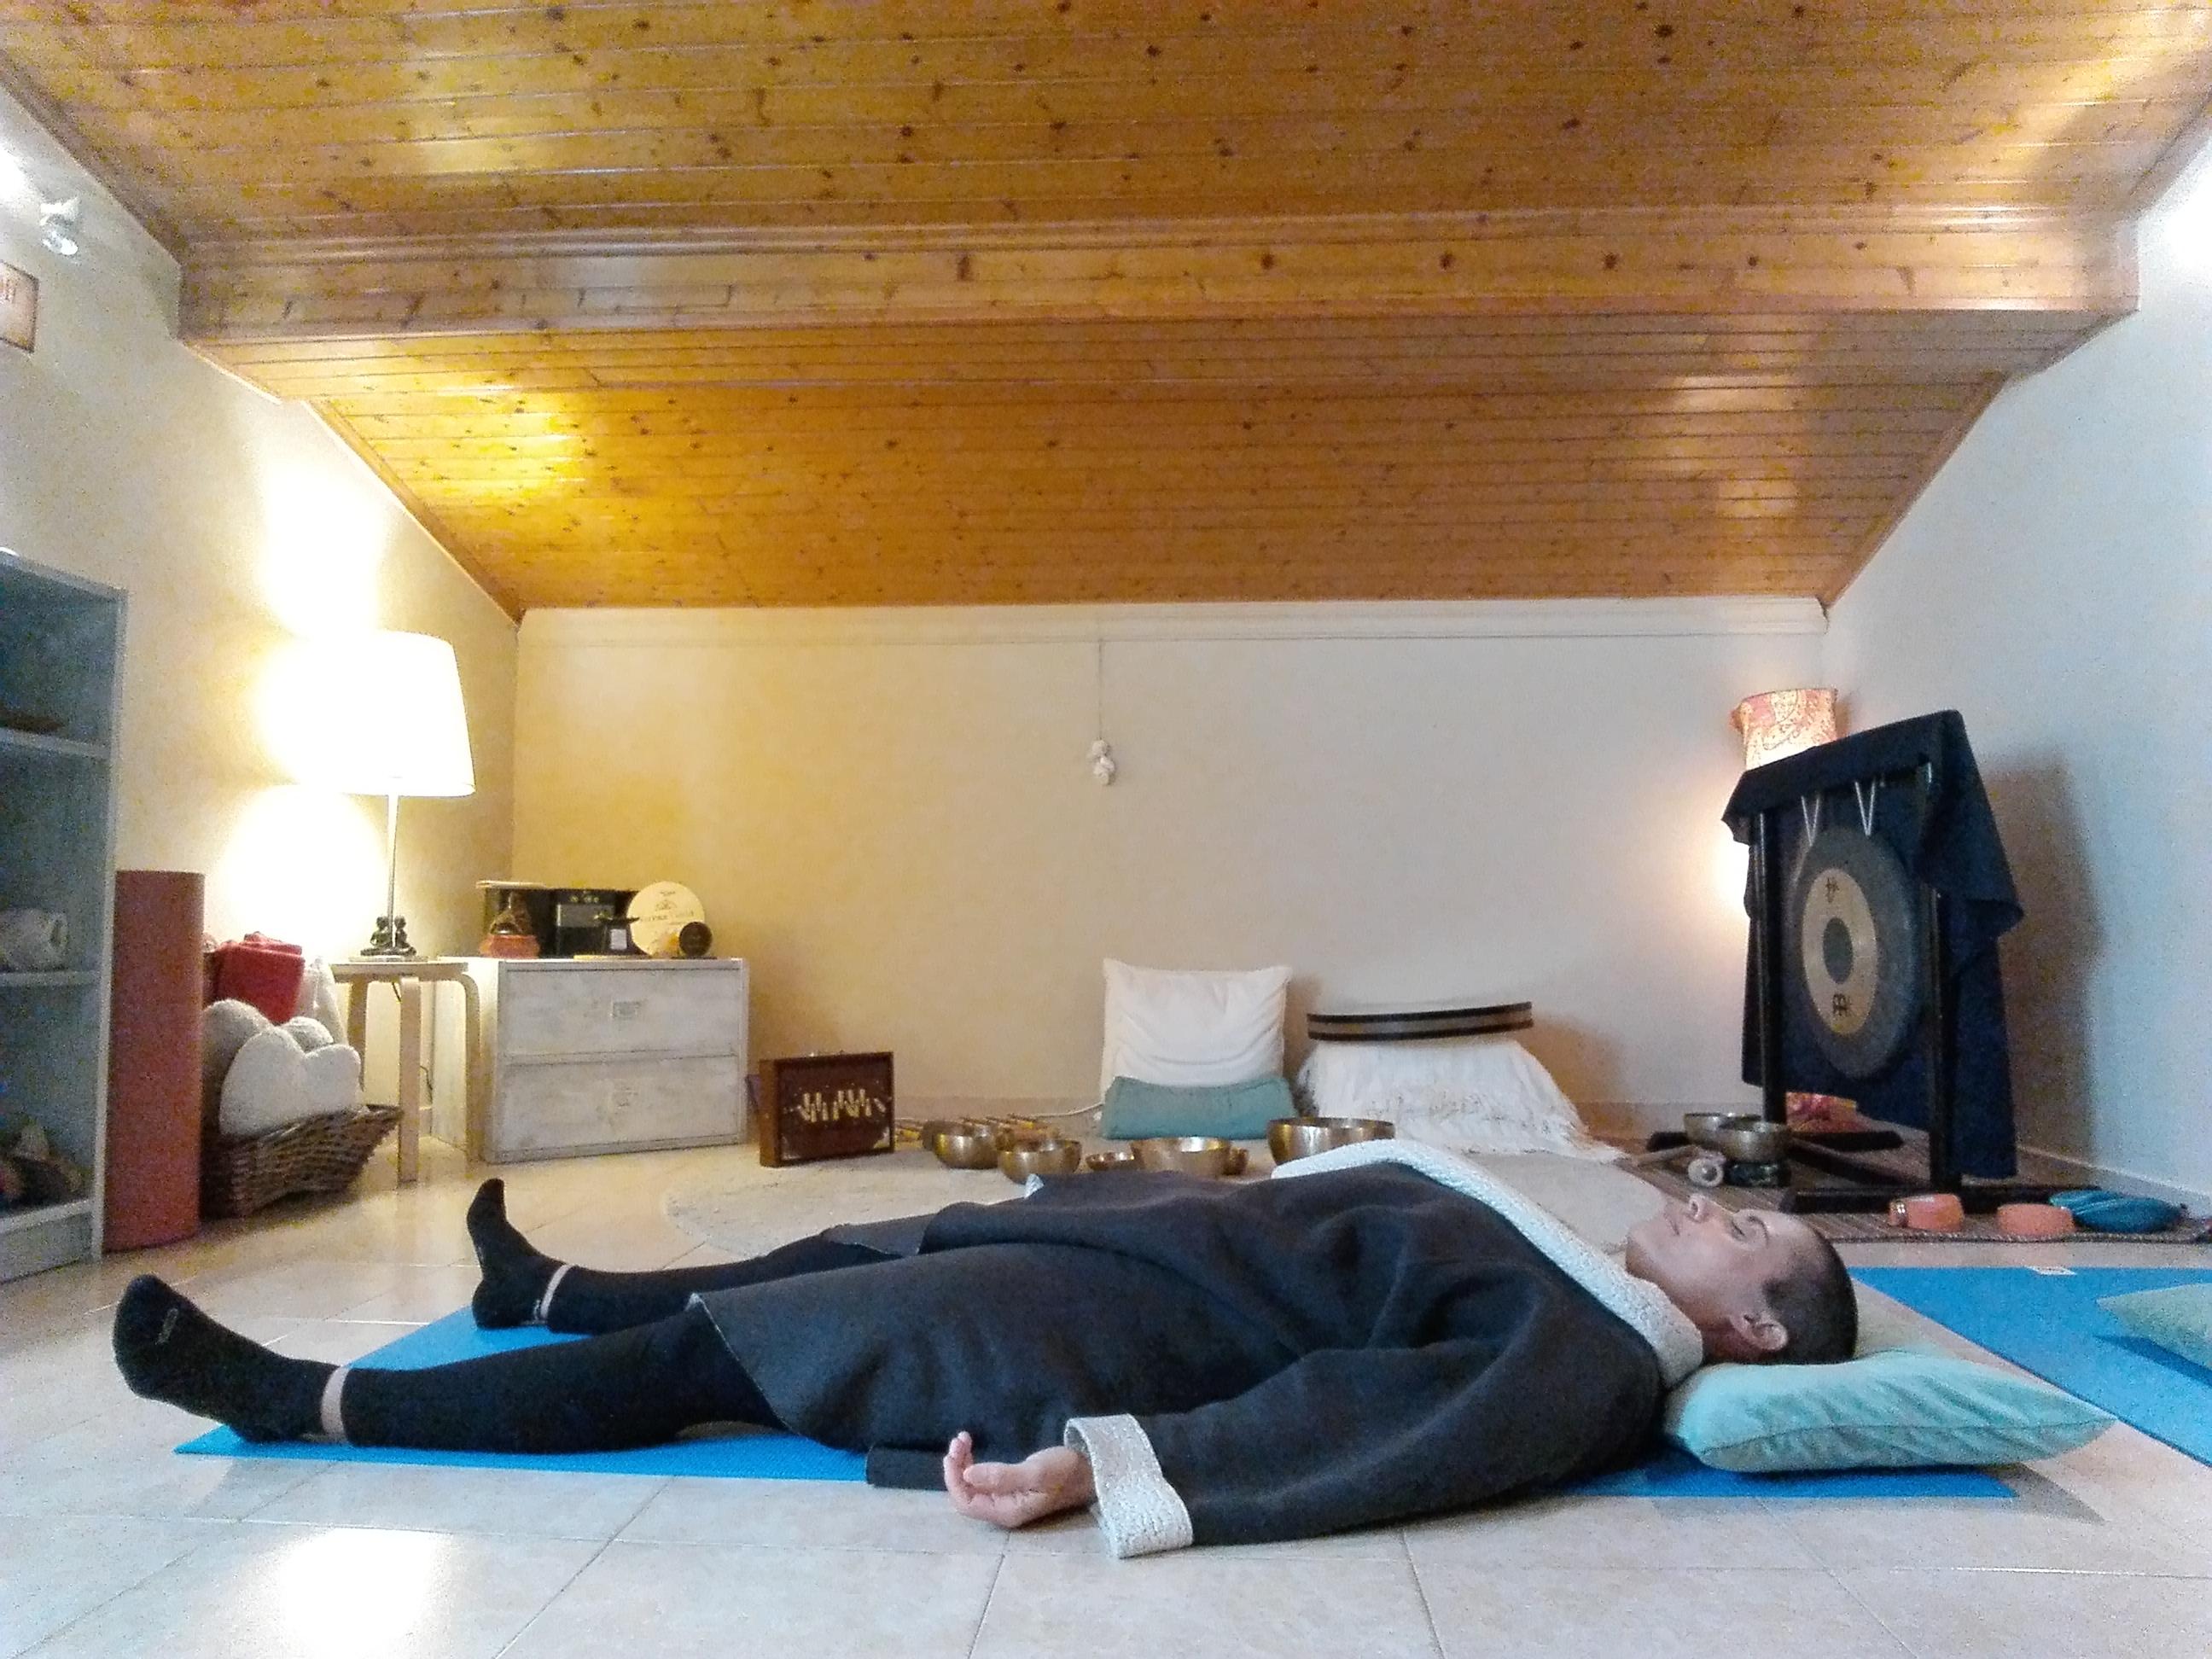 Postura exercício completo_Teresa Viana